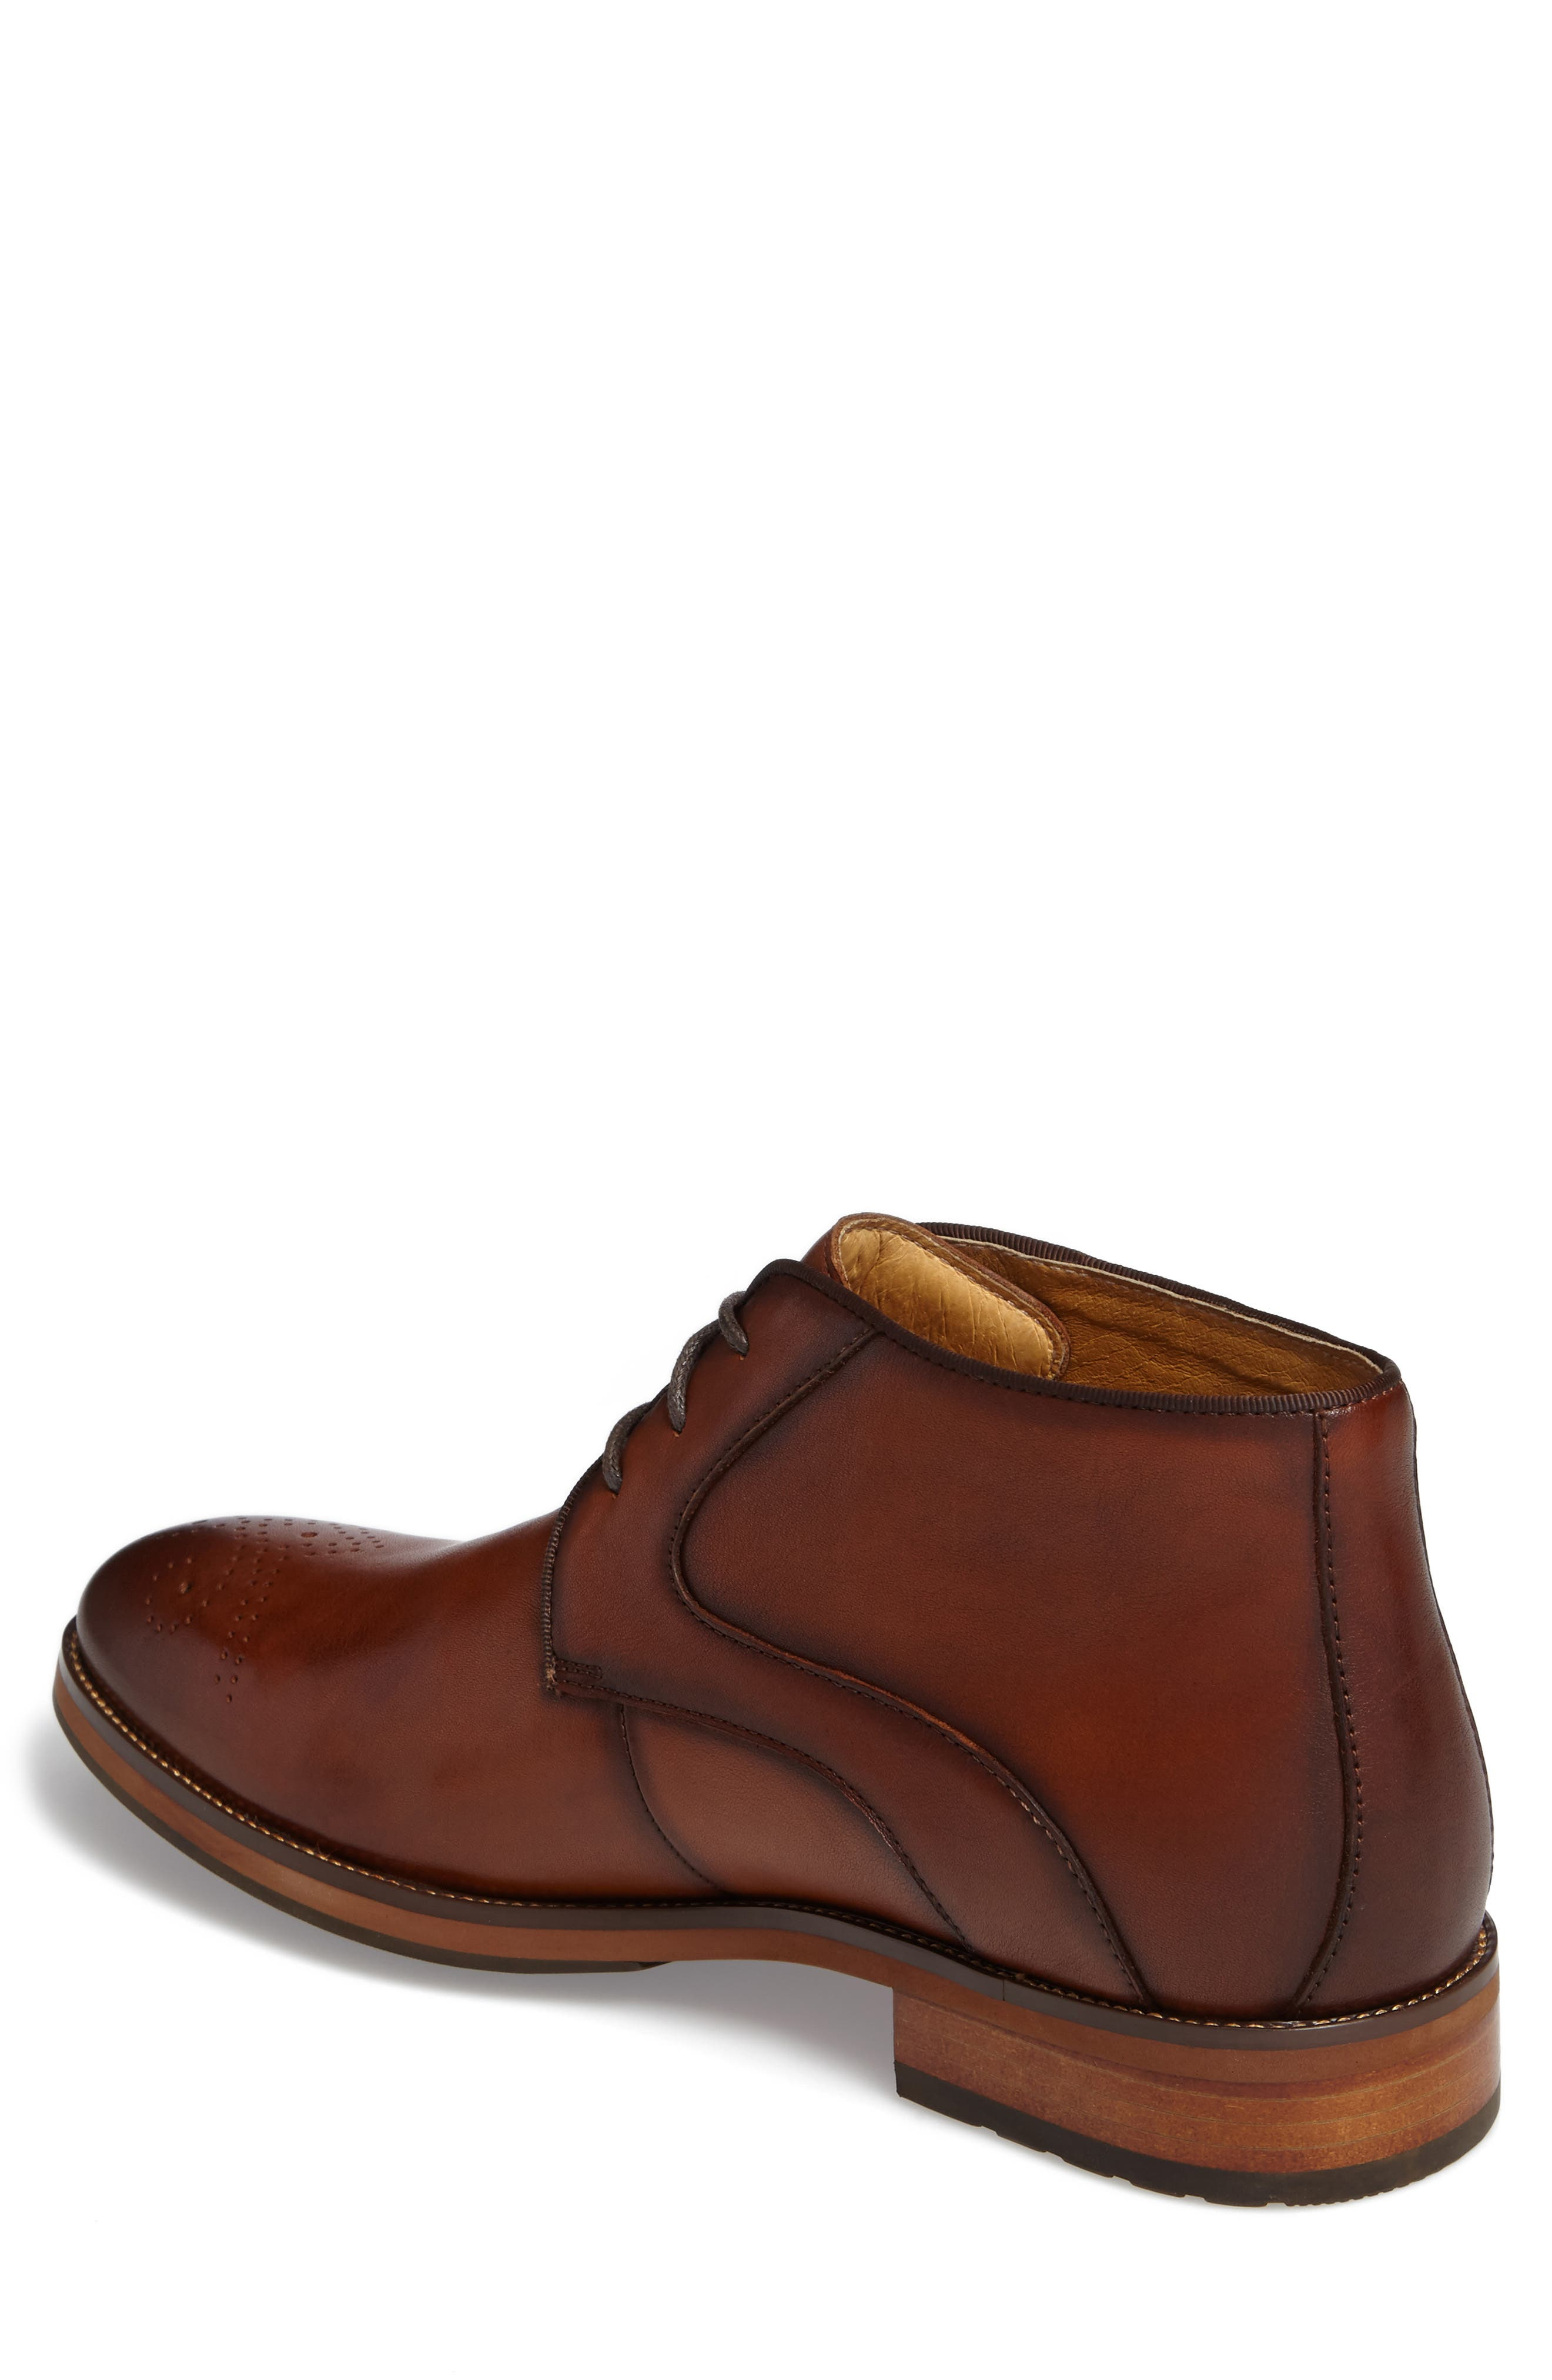 Blaze Chukka Boot,                             Alternate thumbnail 2, color,                             Cognac Leather